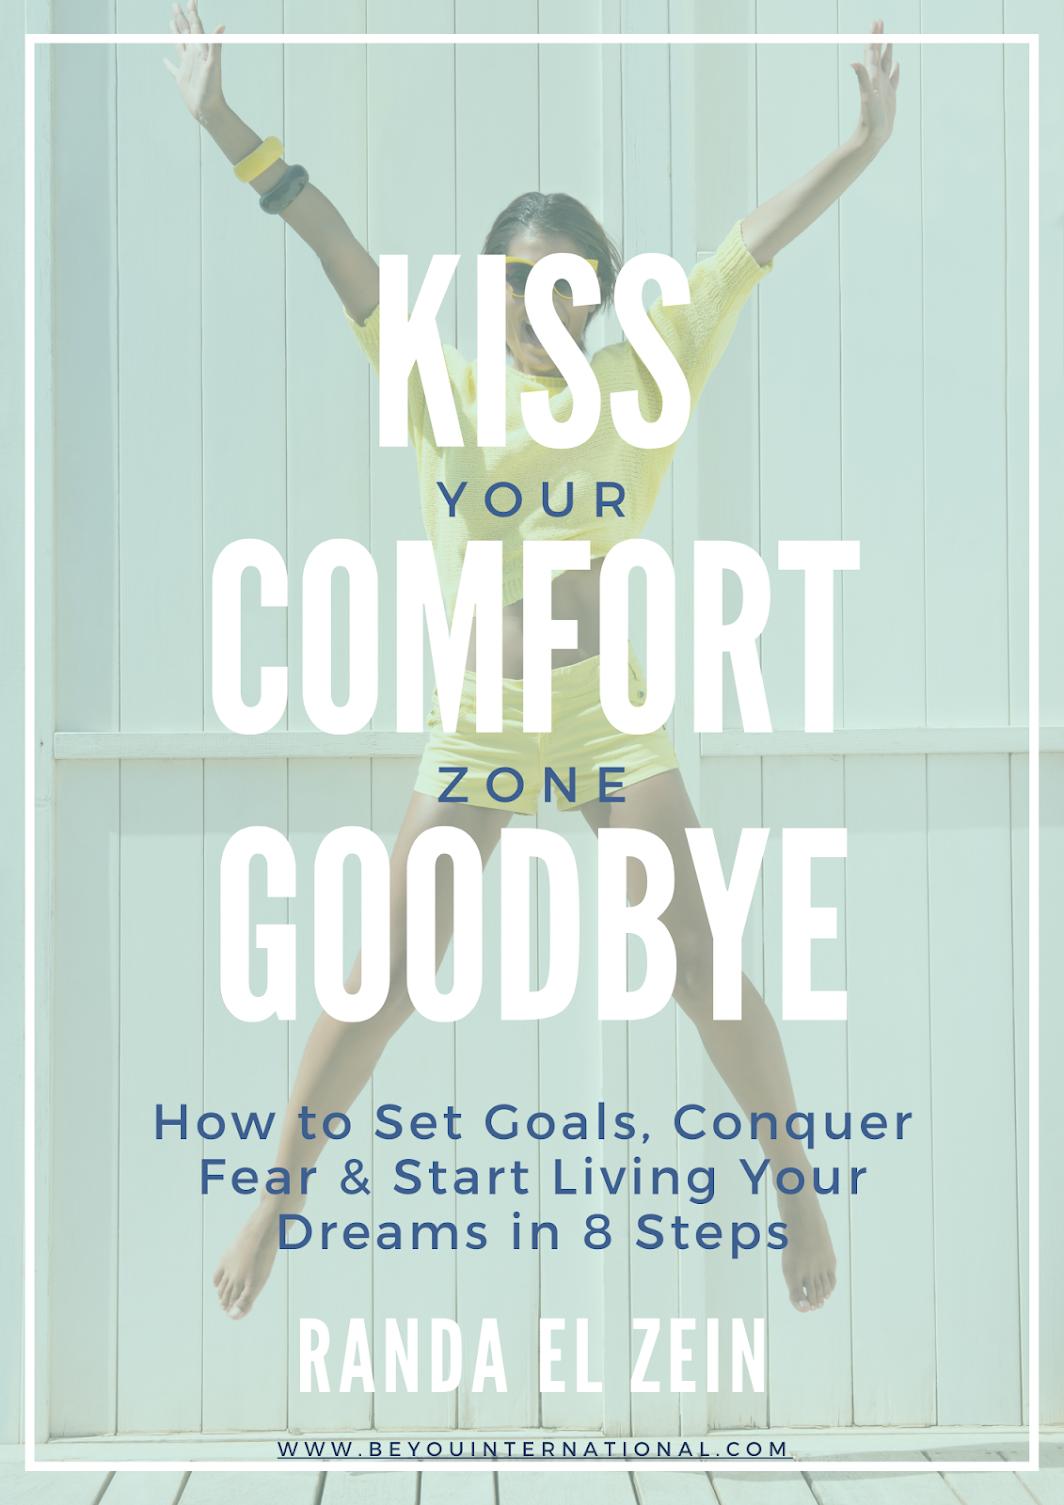 Kiss Your Comfort Zone Goodbye